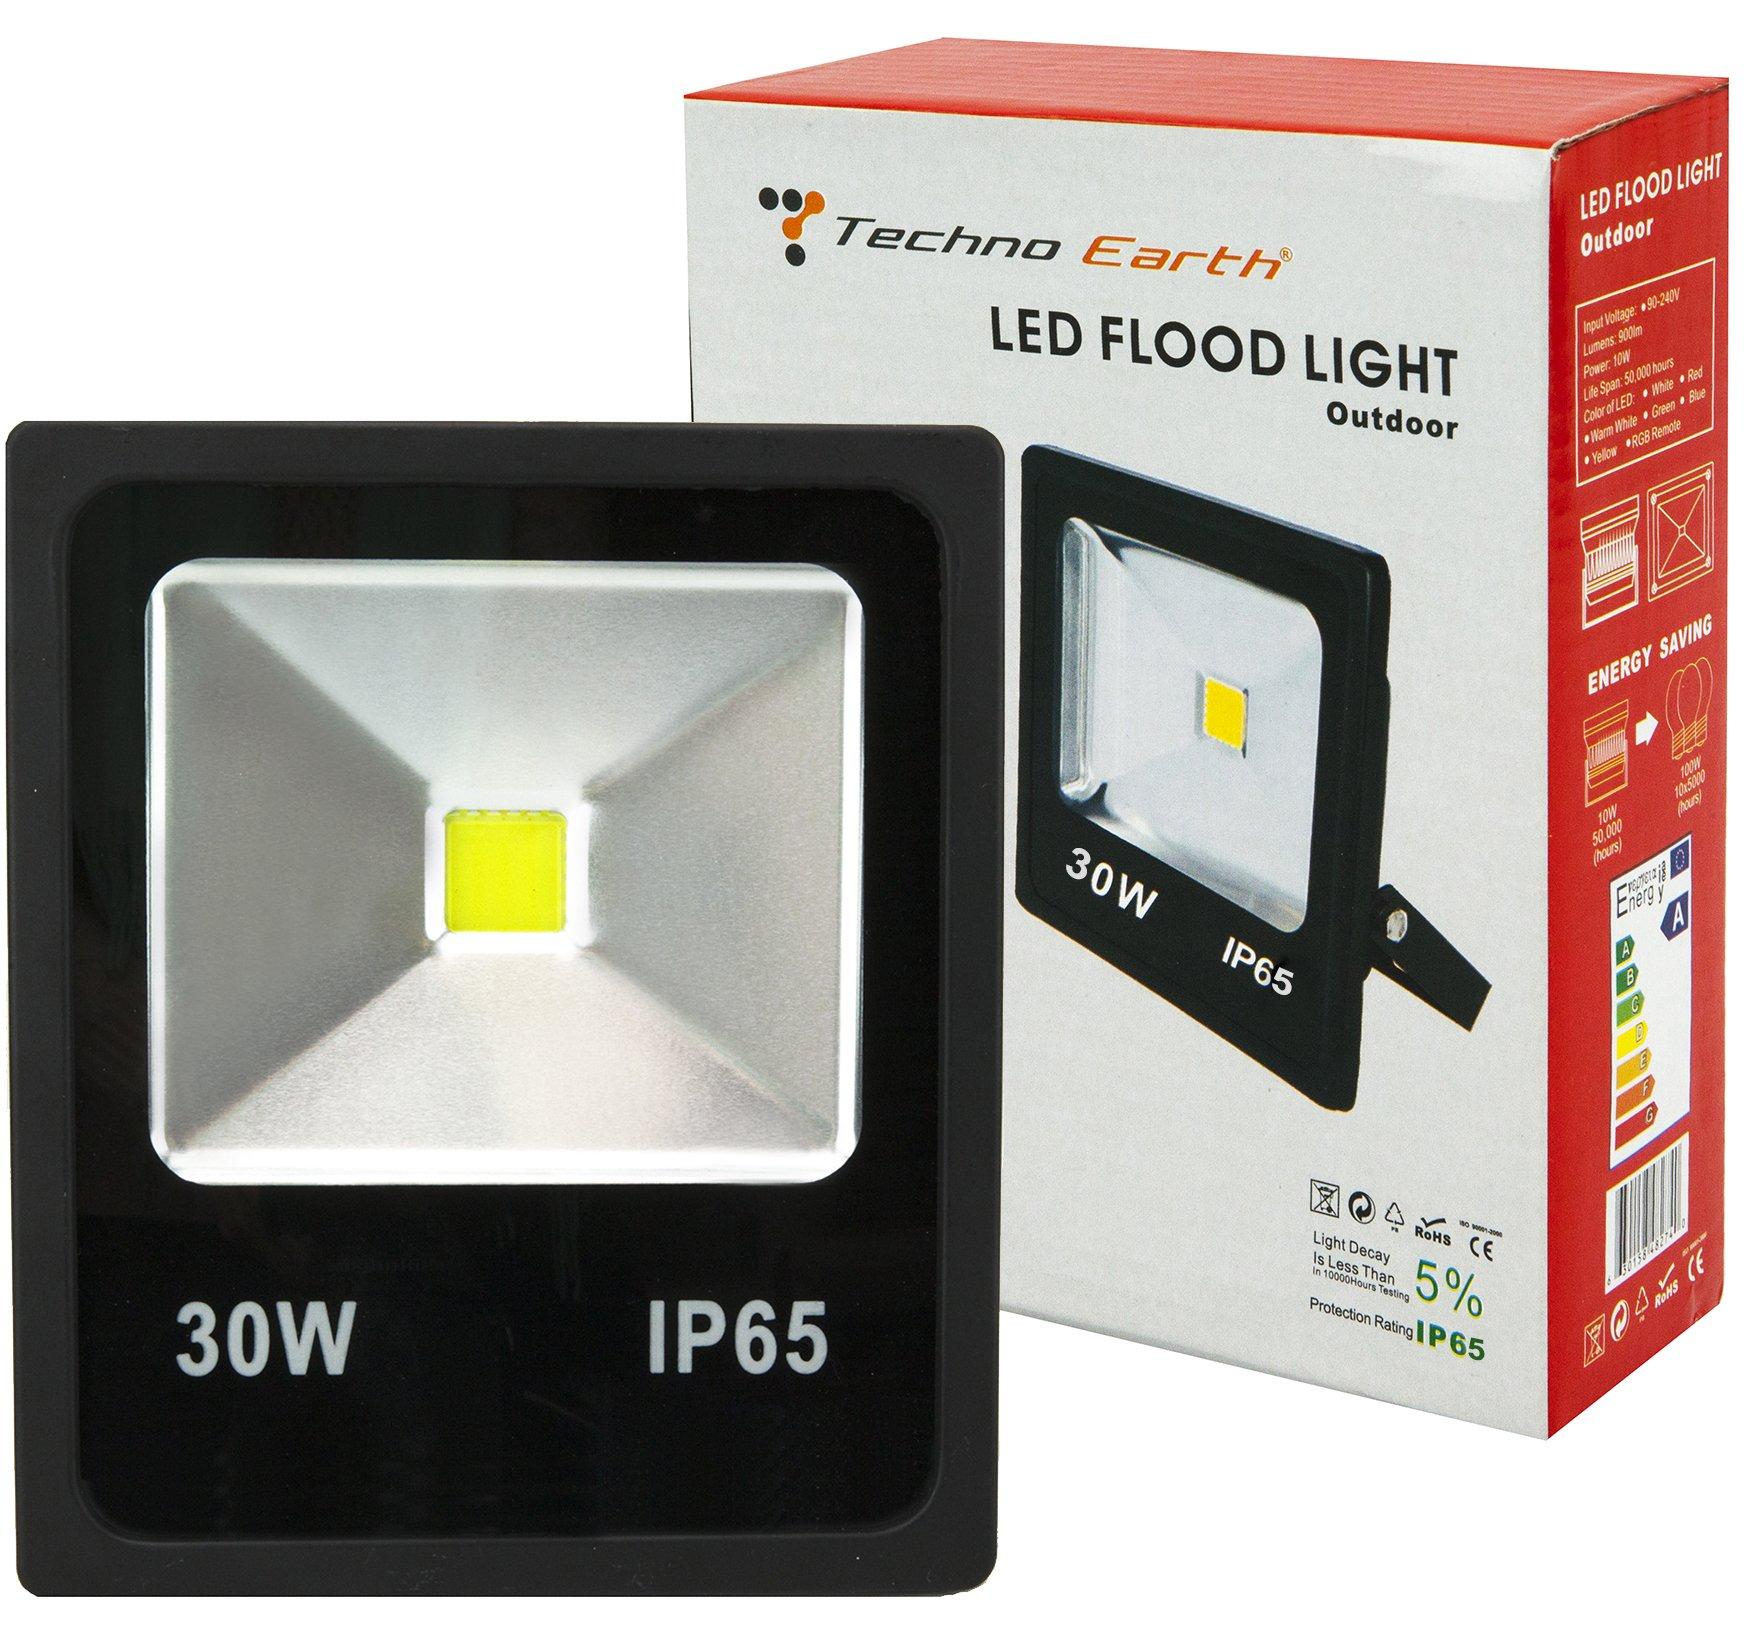 Techno Earth F30K 90-240V 120-Degree Beam Angle Landscape Outdoor Waterproof 30W LED Flood Light Lamp, Cool White